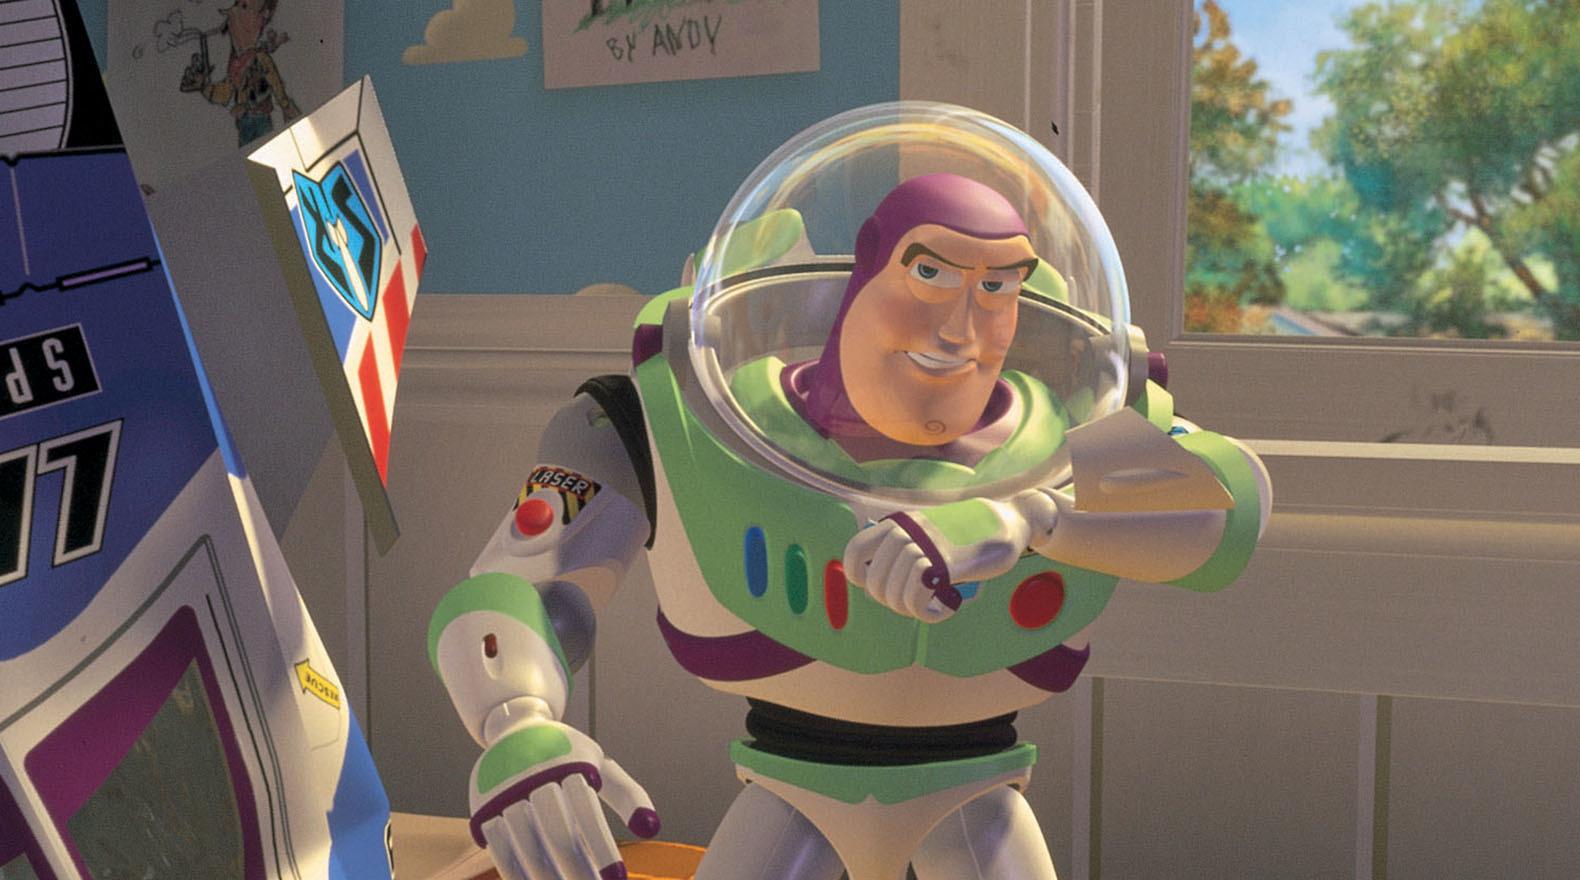 Buzz Lightyear Gallery Toy Story